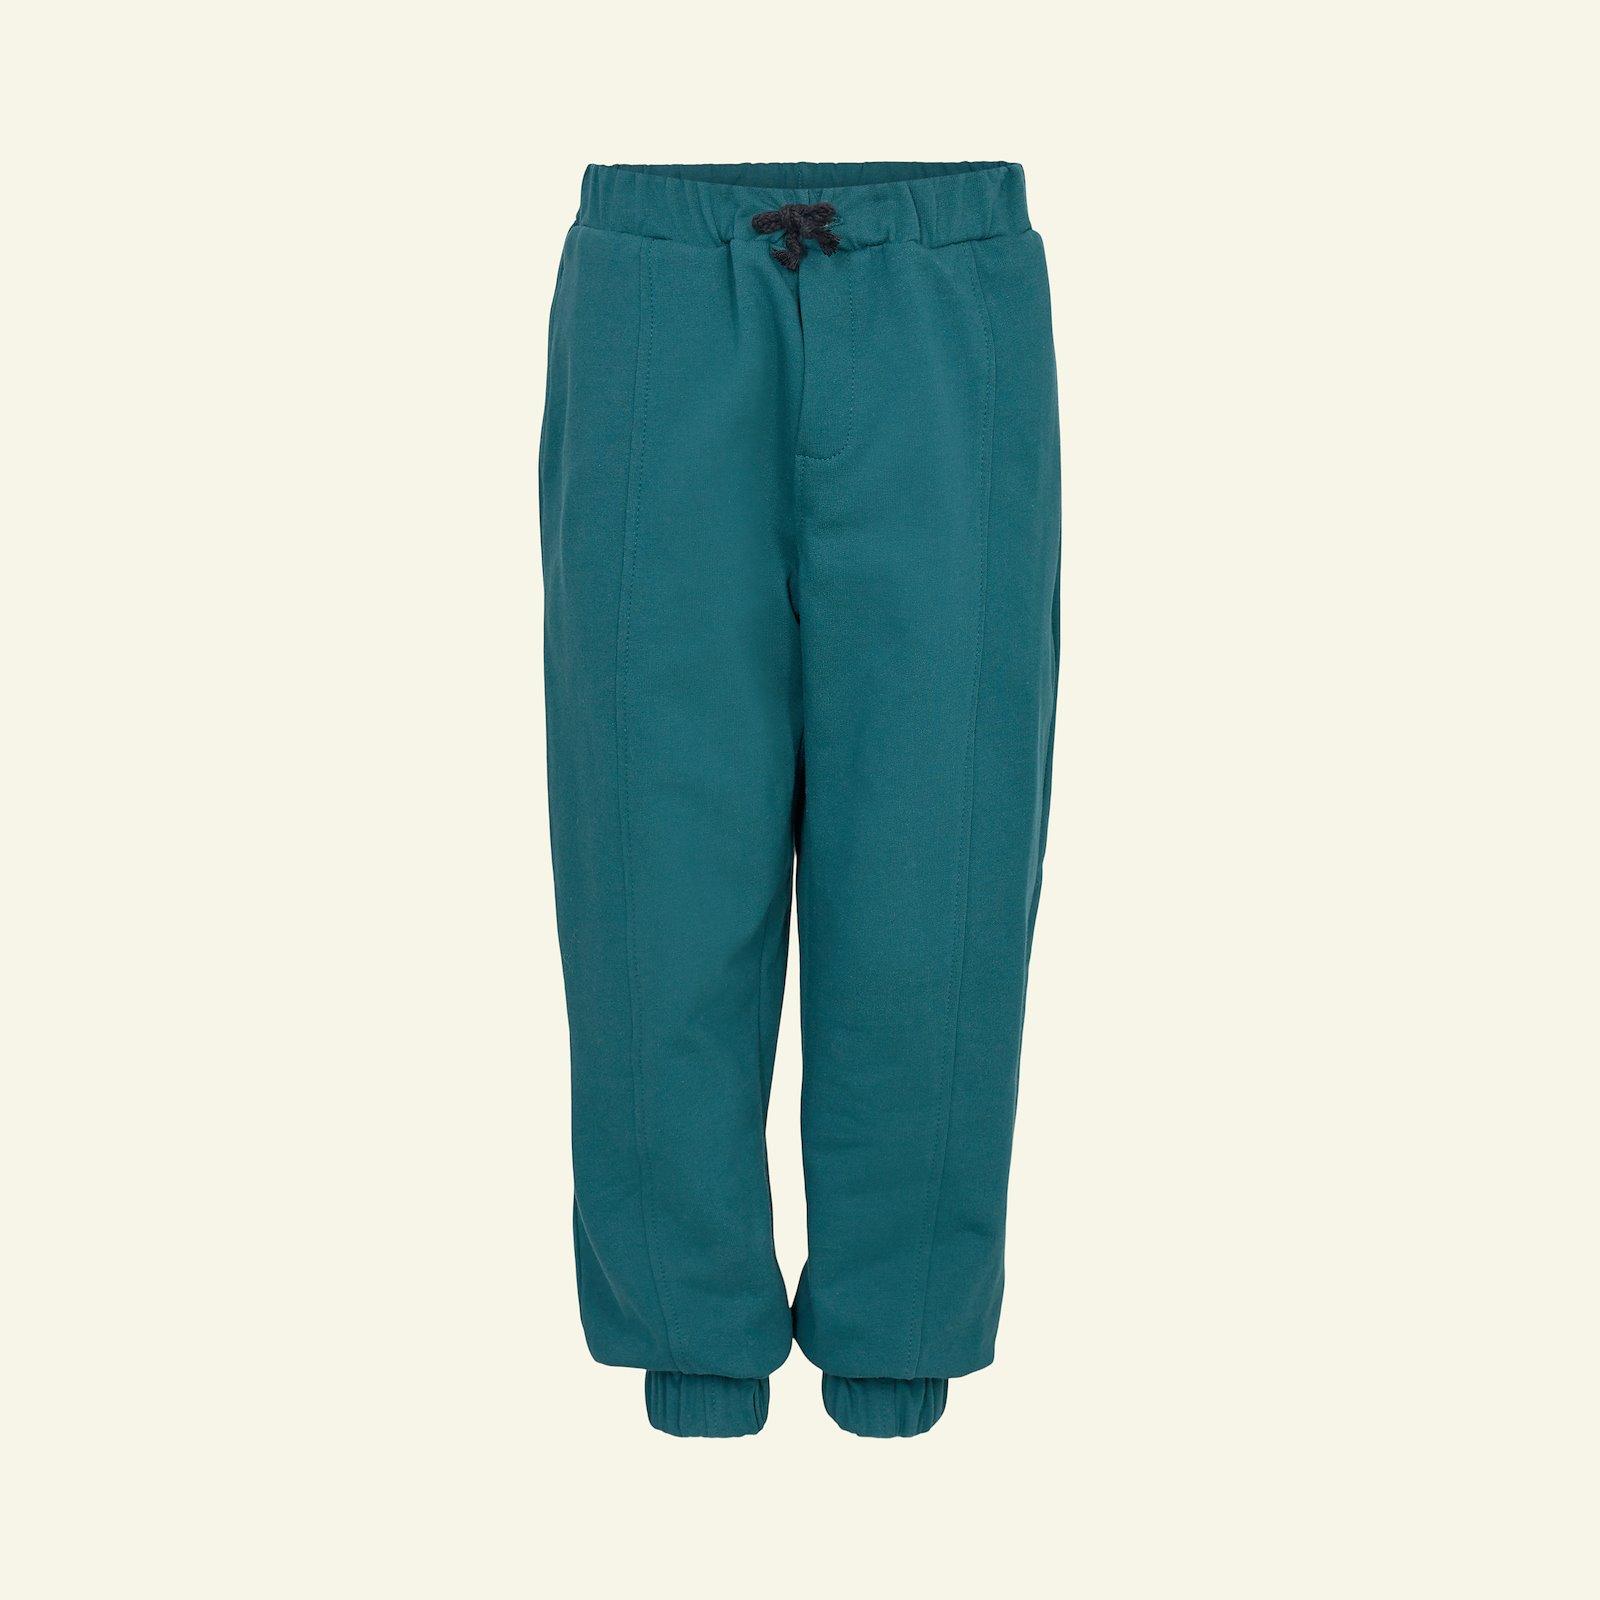 Sweat pants p60040_211775_75243_sskit